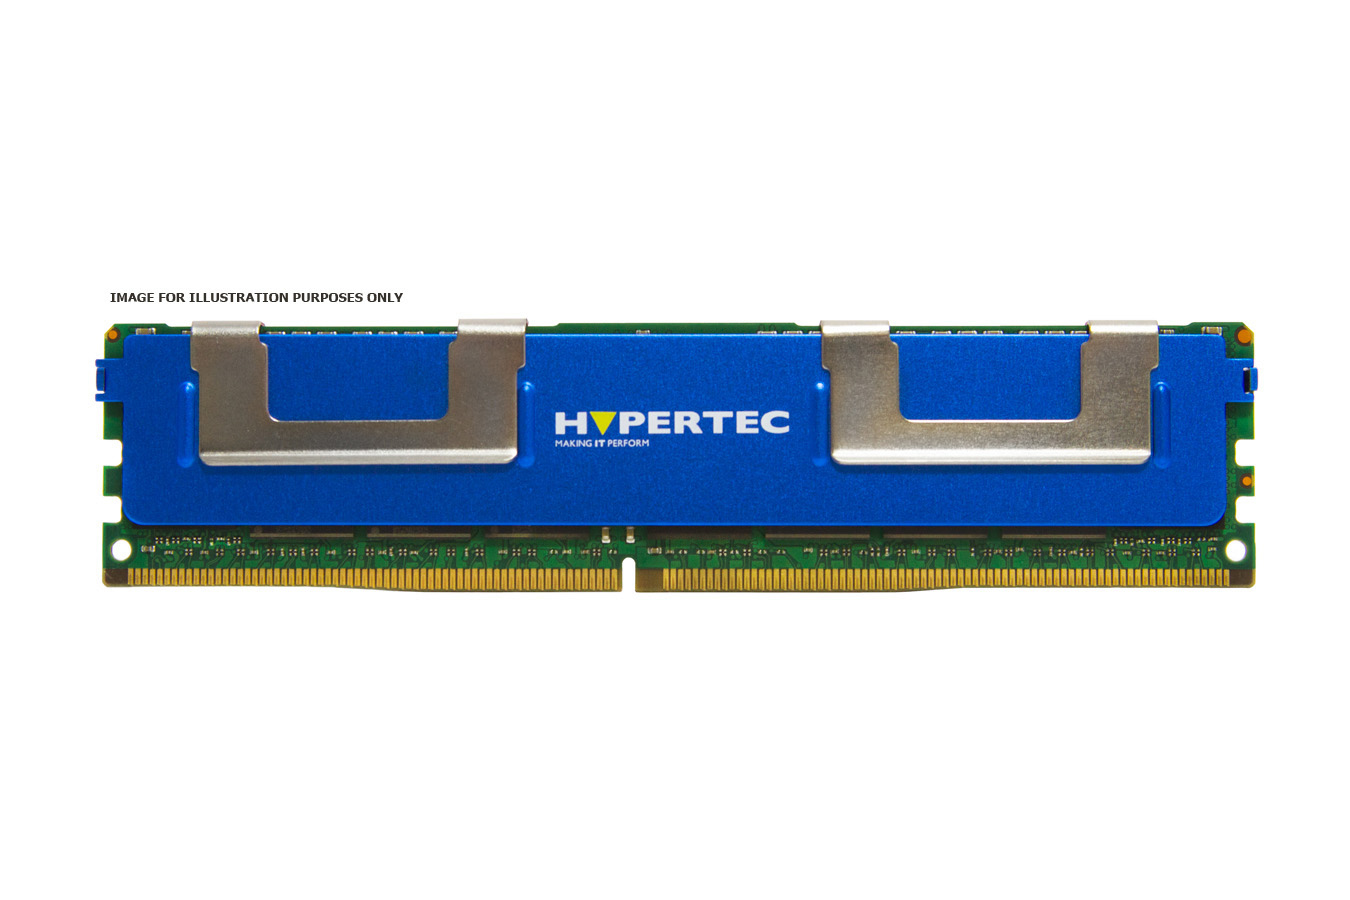 Hypertec SNPP9RN2C/8G-HY memory module 8 GB DDR3 ECC